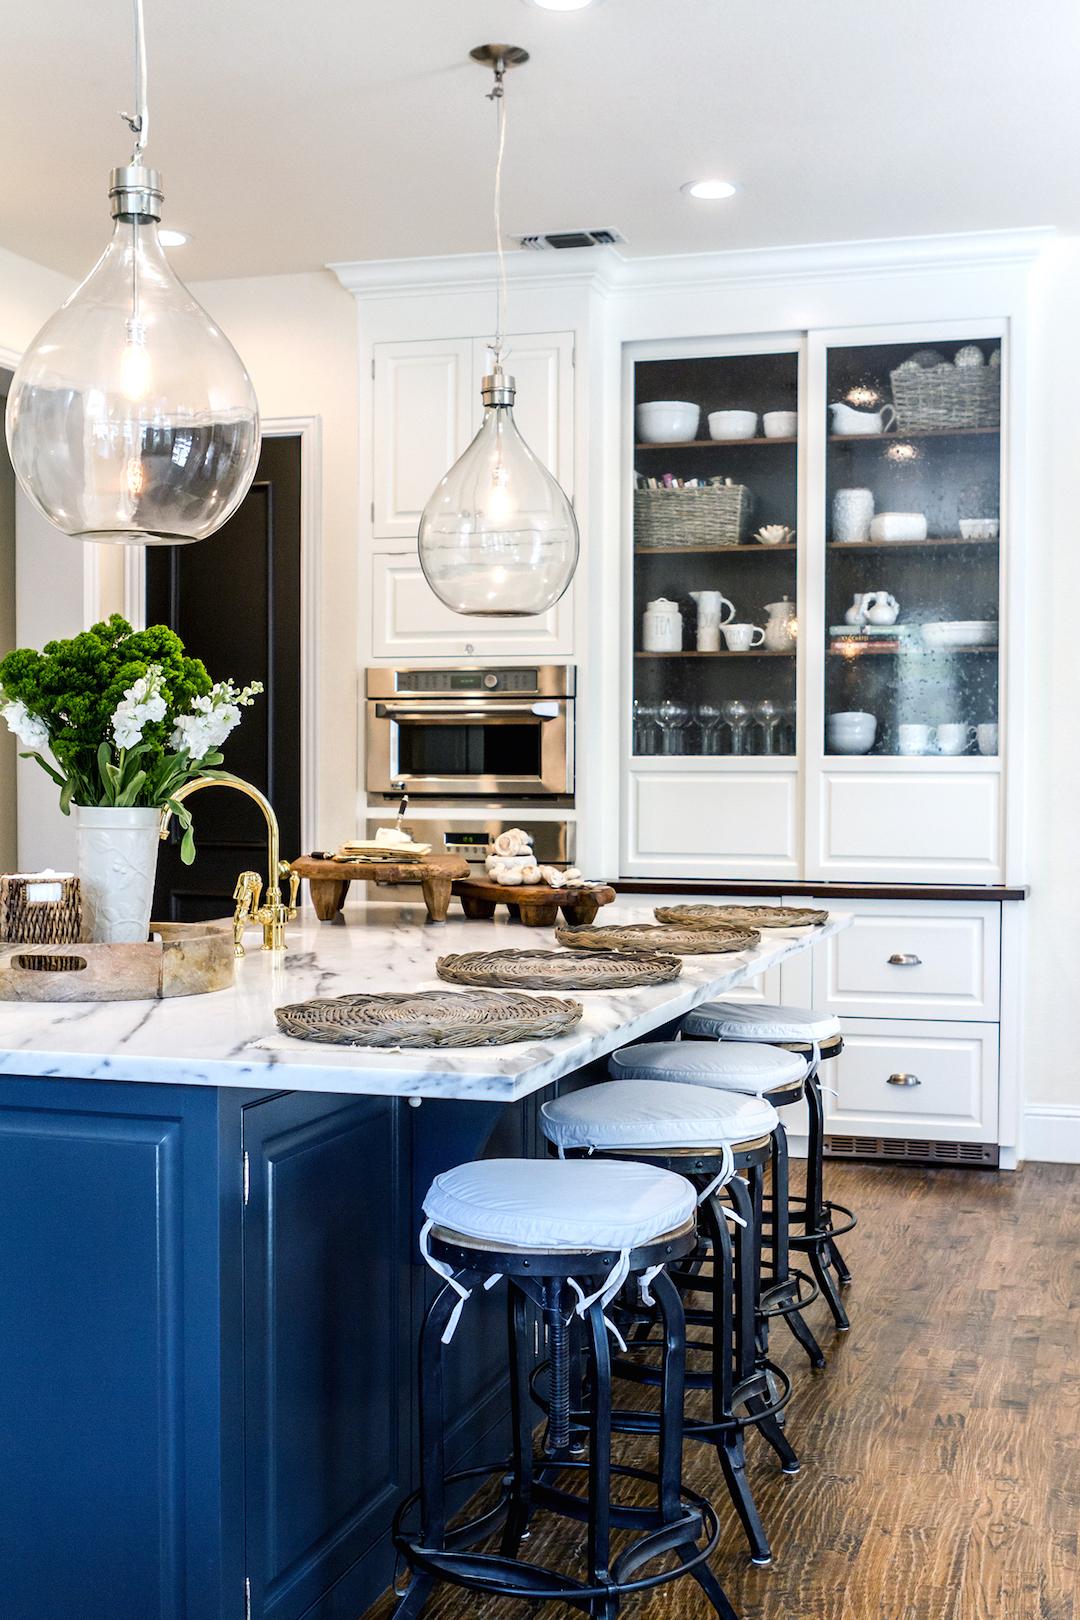 Decor Inspiration: A Go-To Kitchen